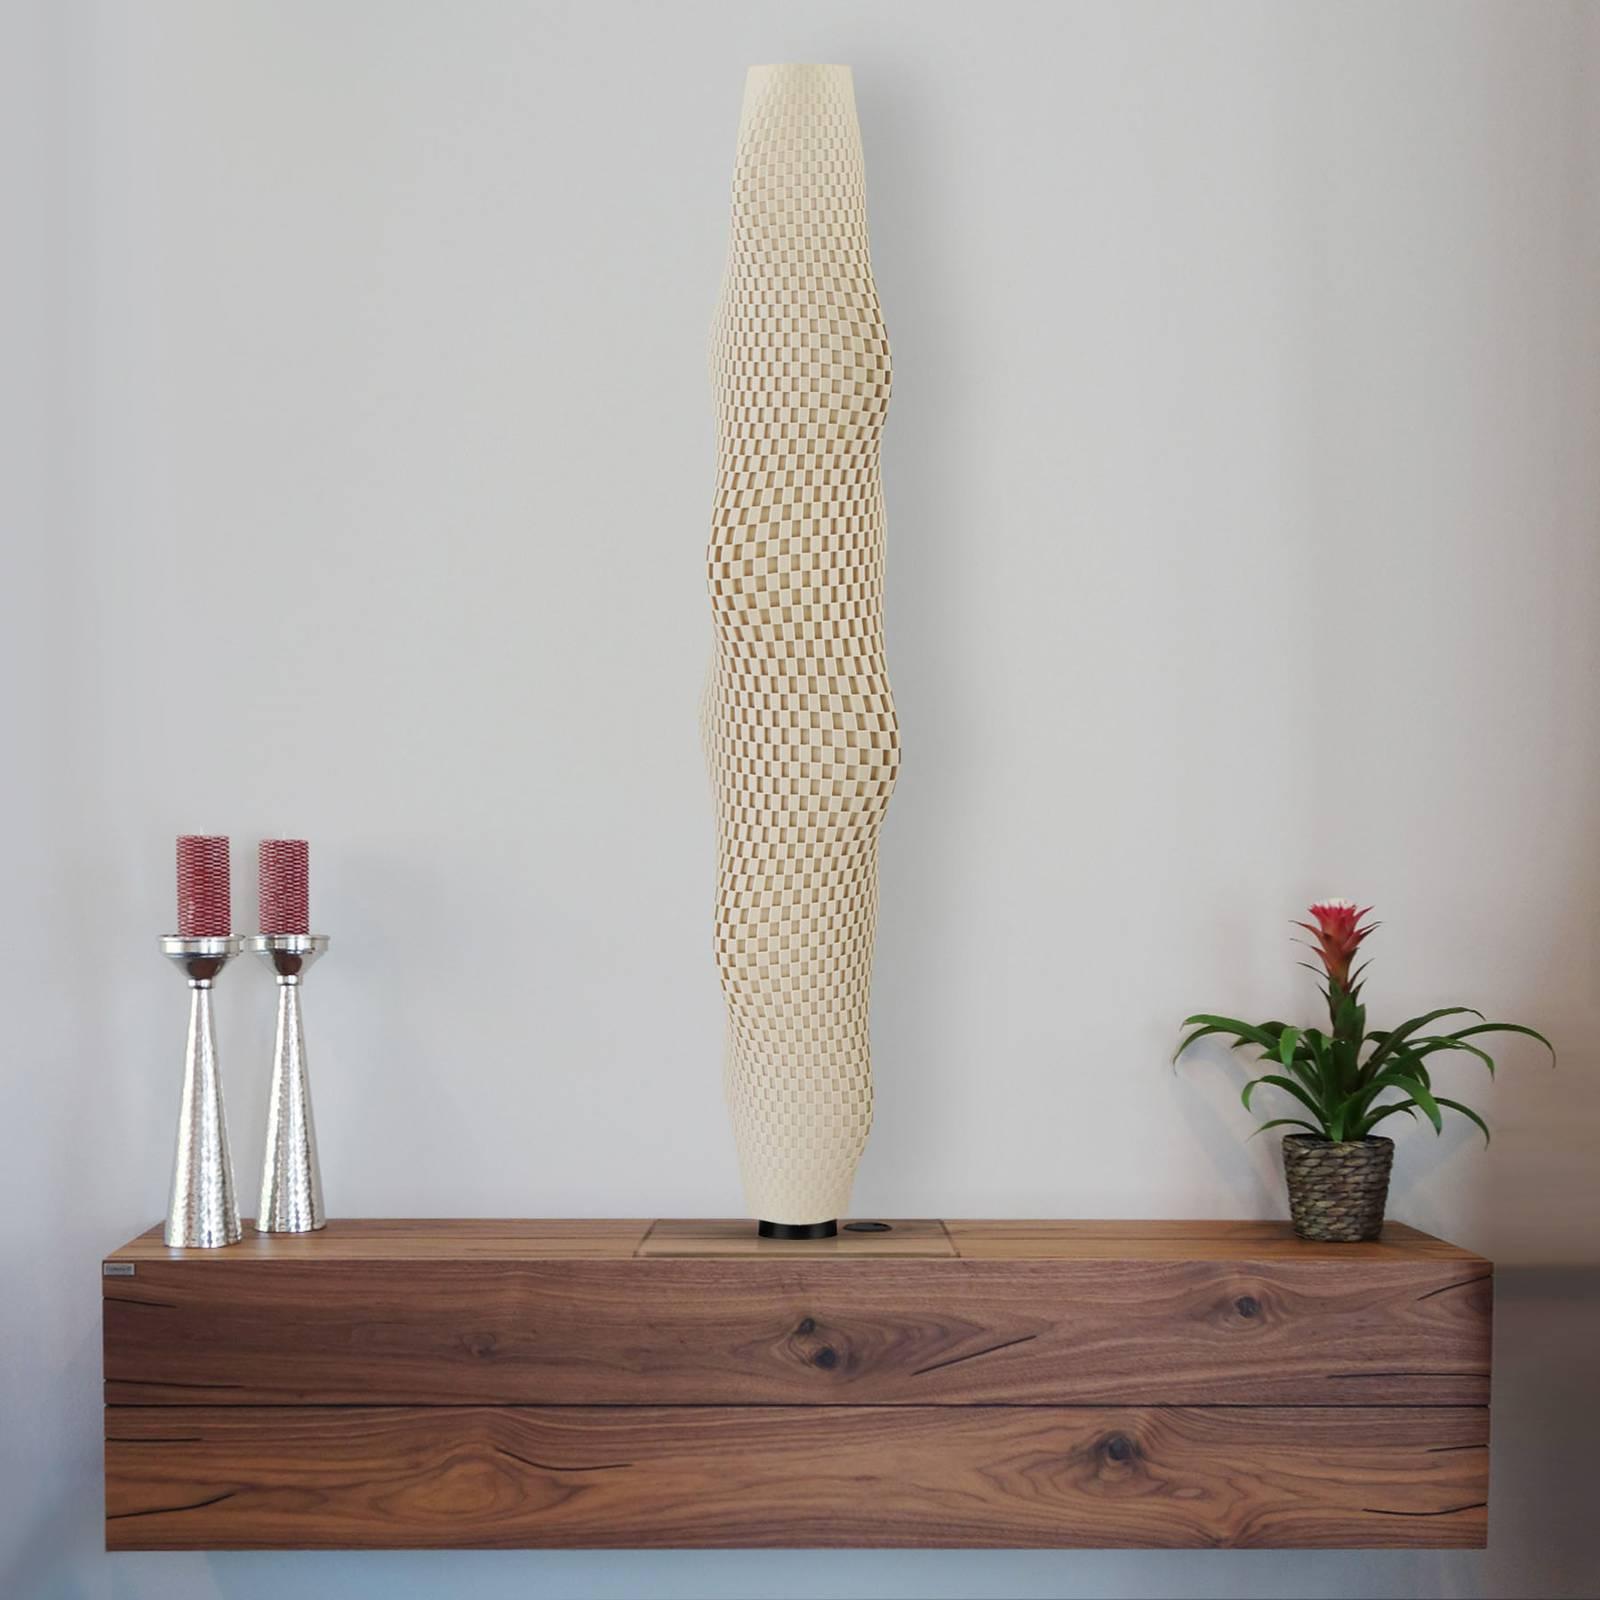 LED-lattiavalo Flechtwerk Kaktus 75 cm, beige